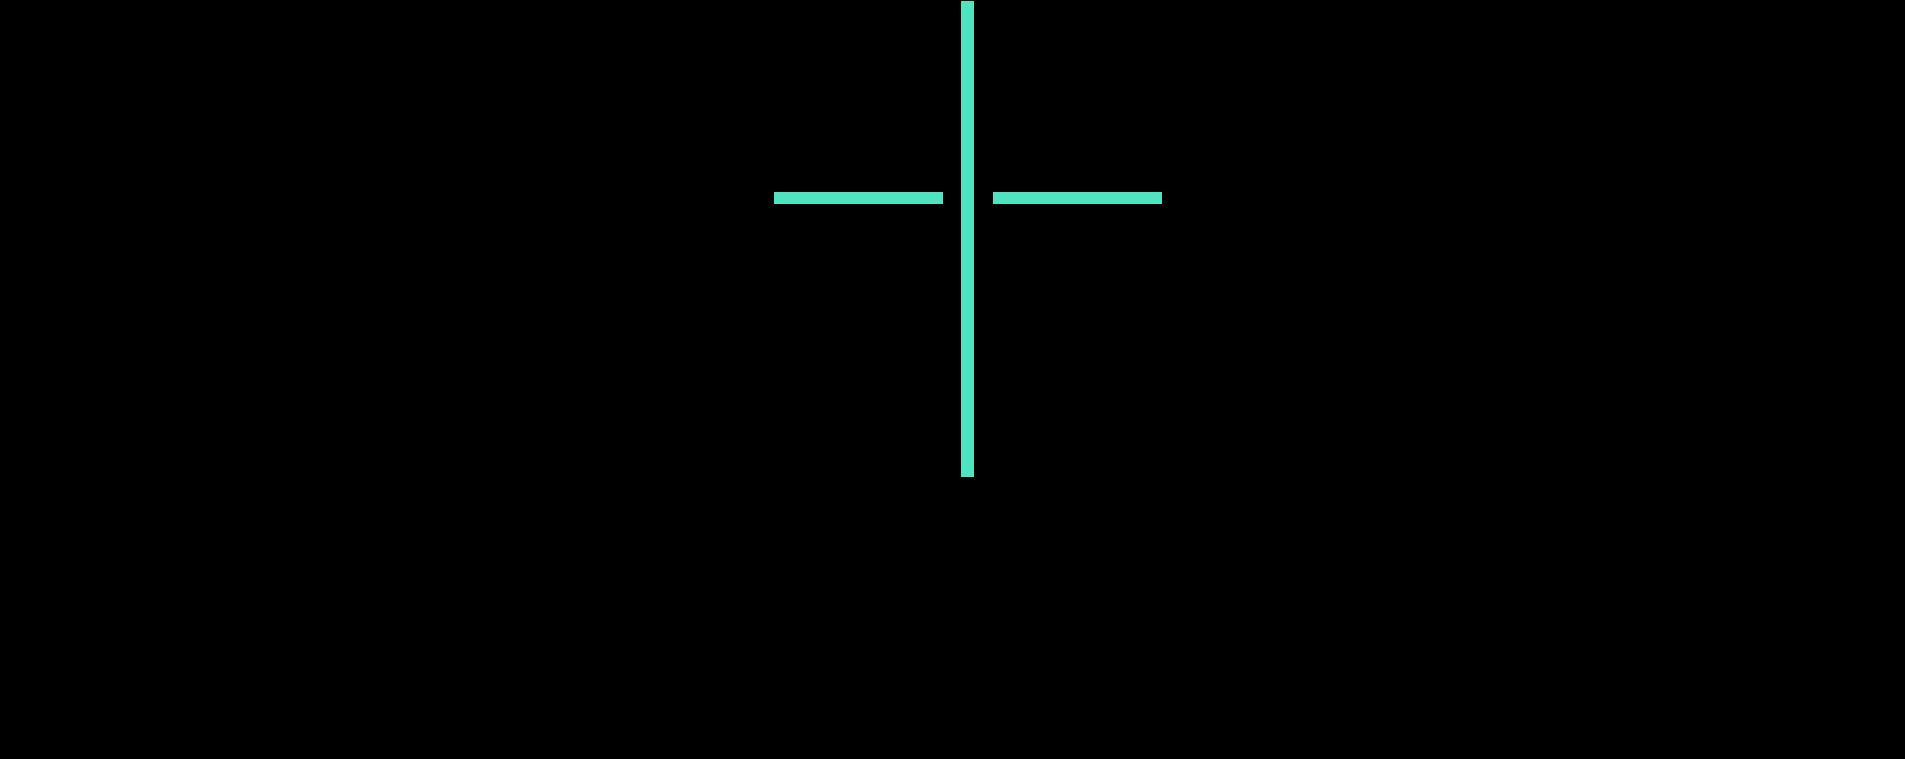 180202 Community of St Frideswide logo outline (green).png